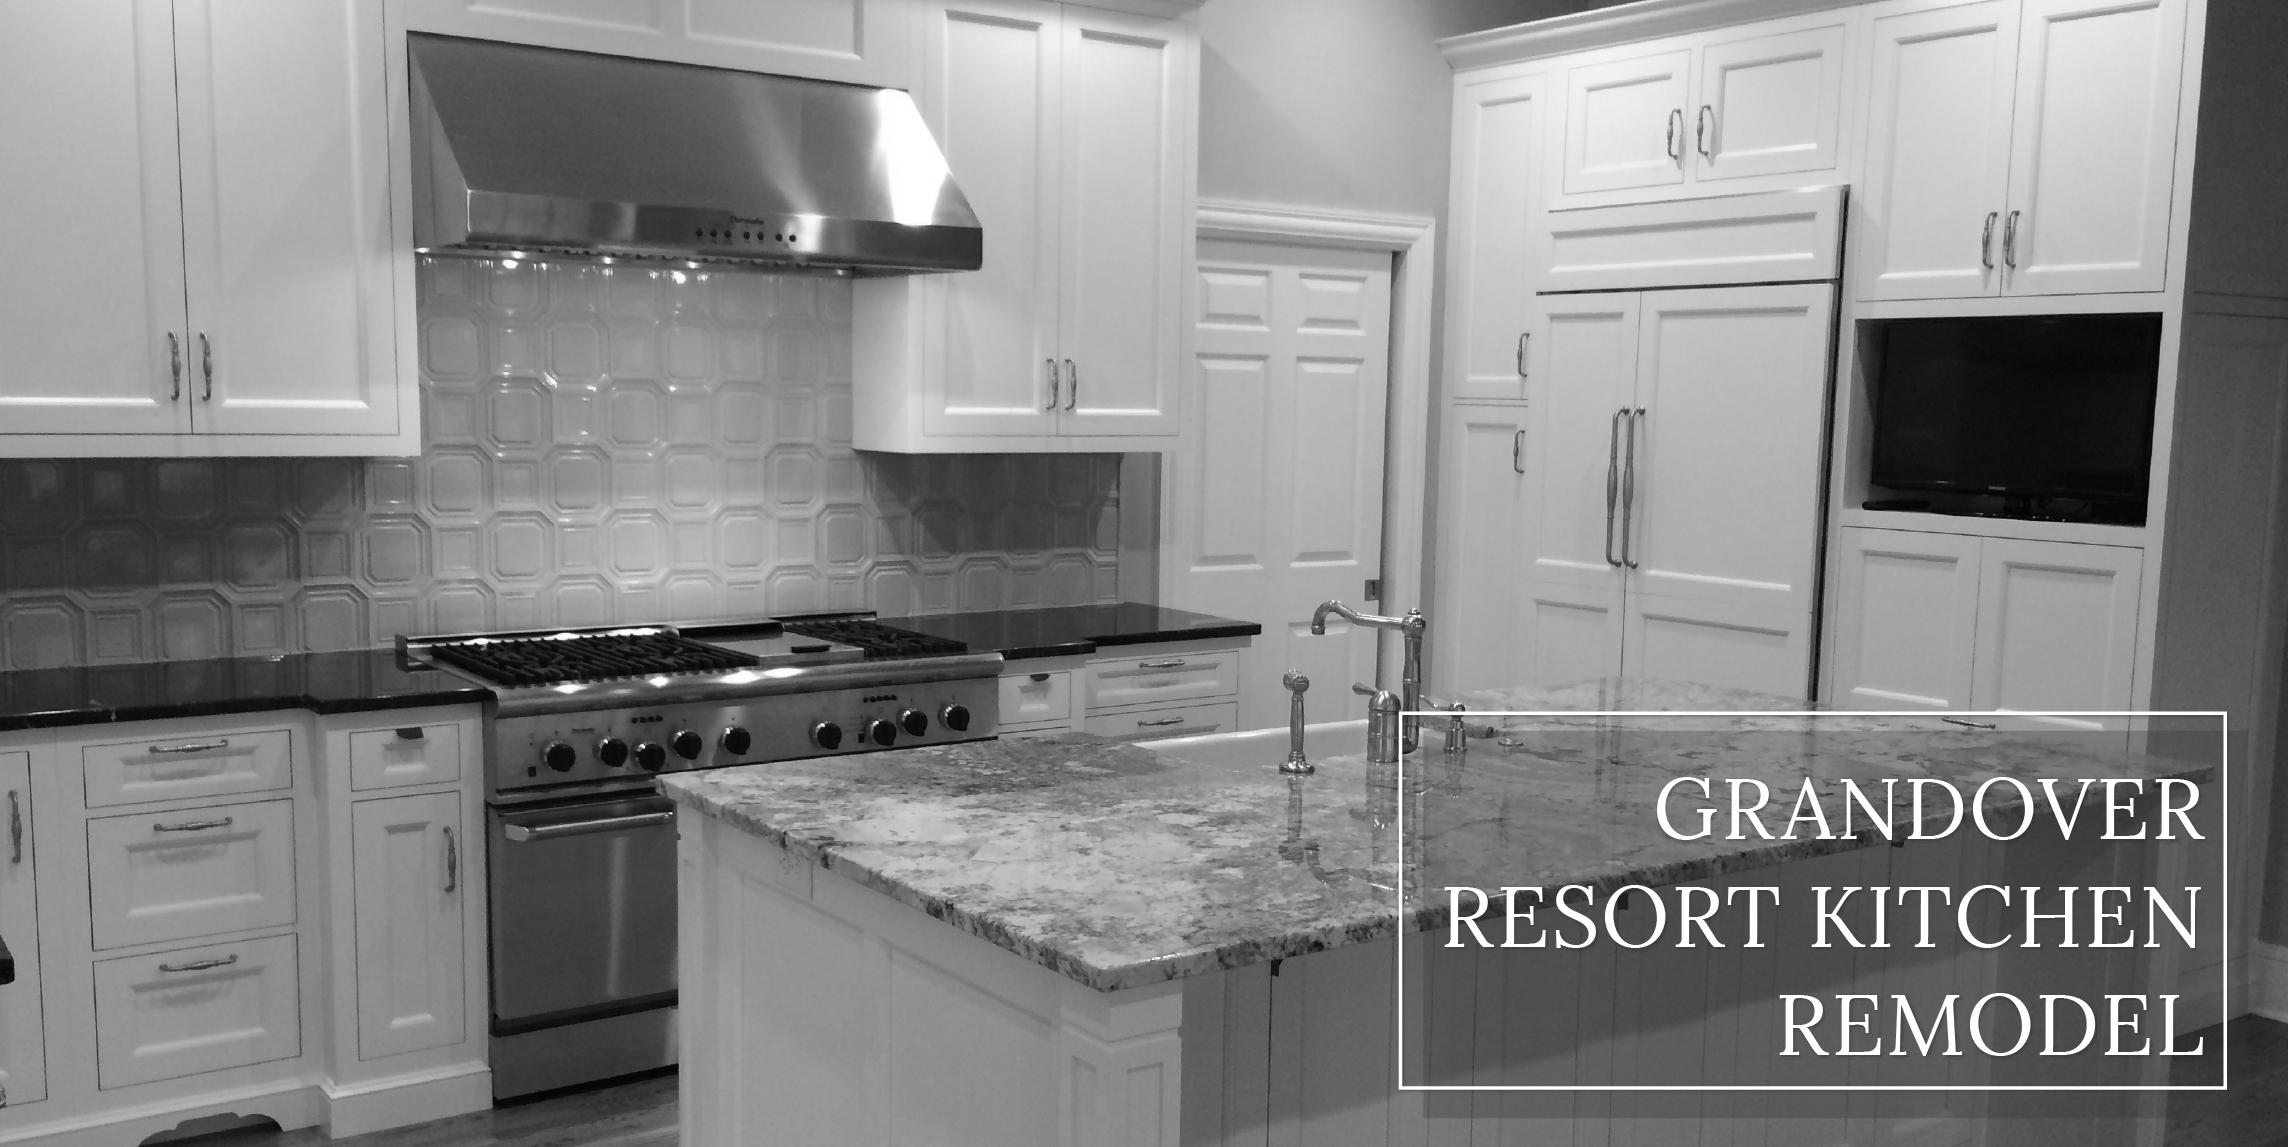 Grandover Kitchen Remodel  |  Dream Kitchen Builders